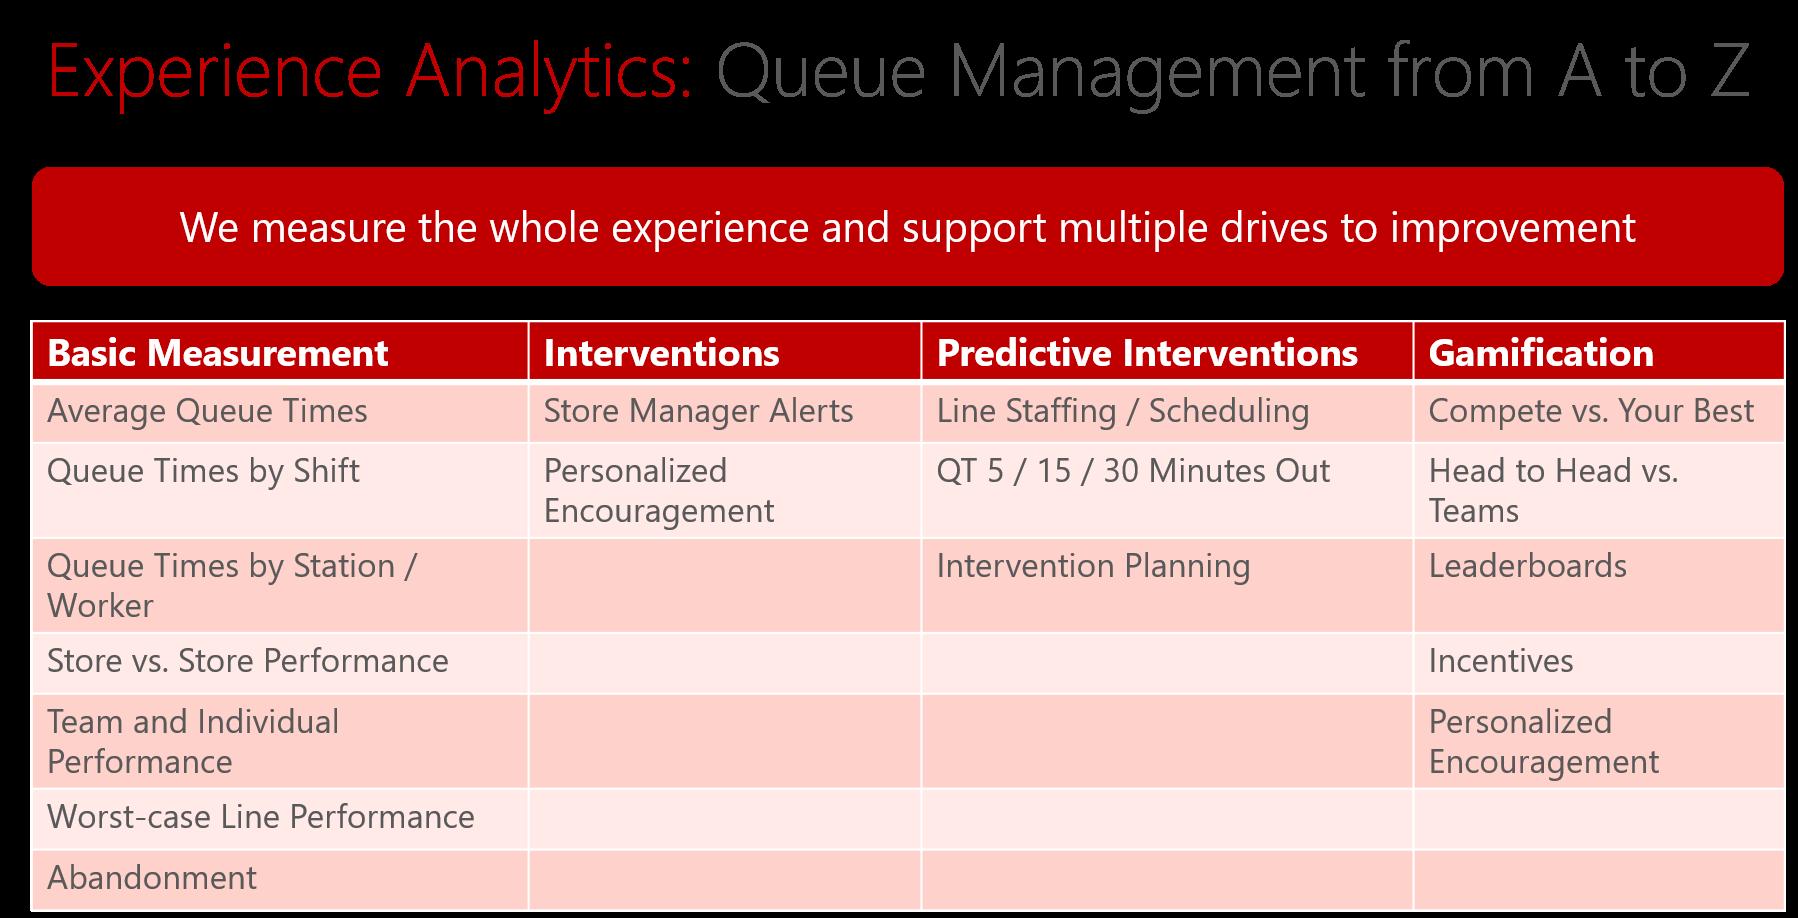 Queue Analytics